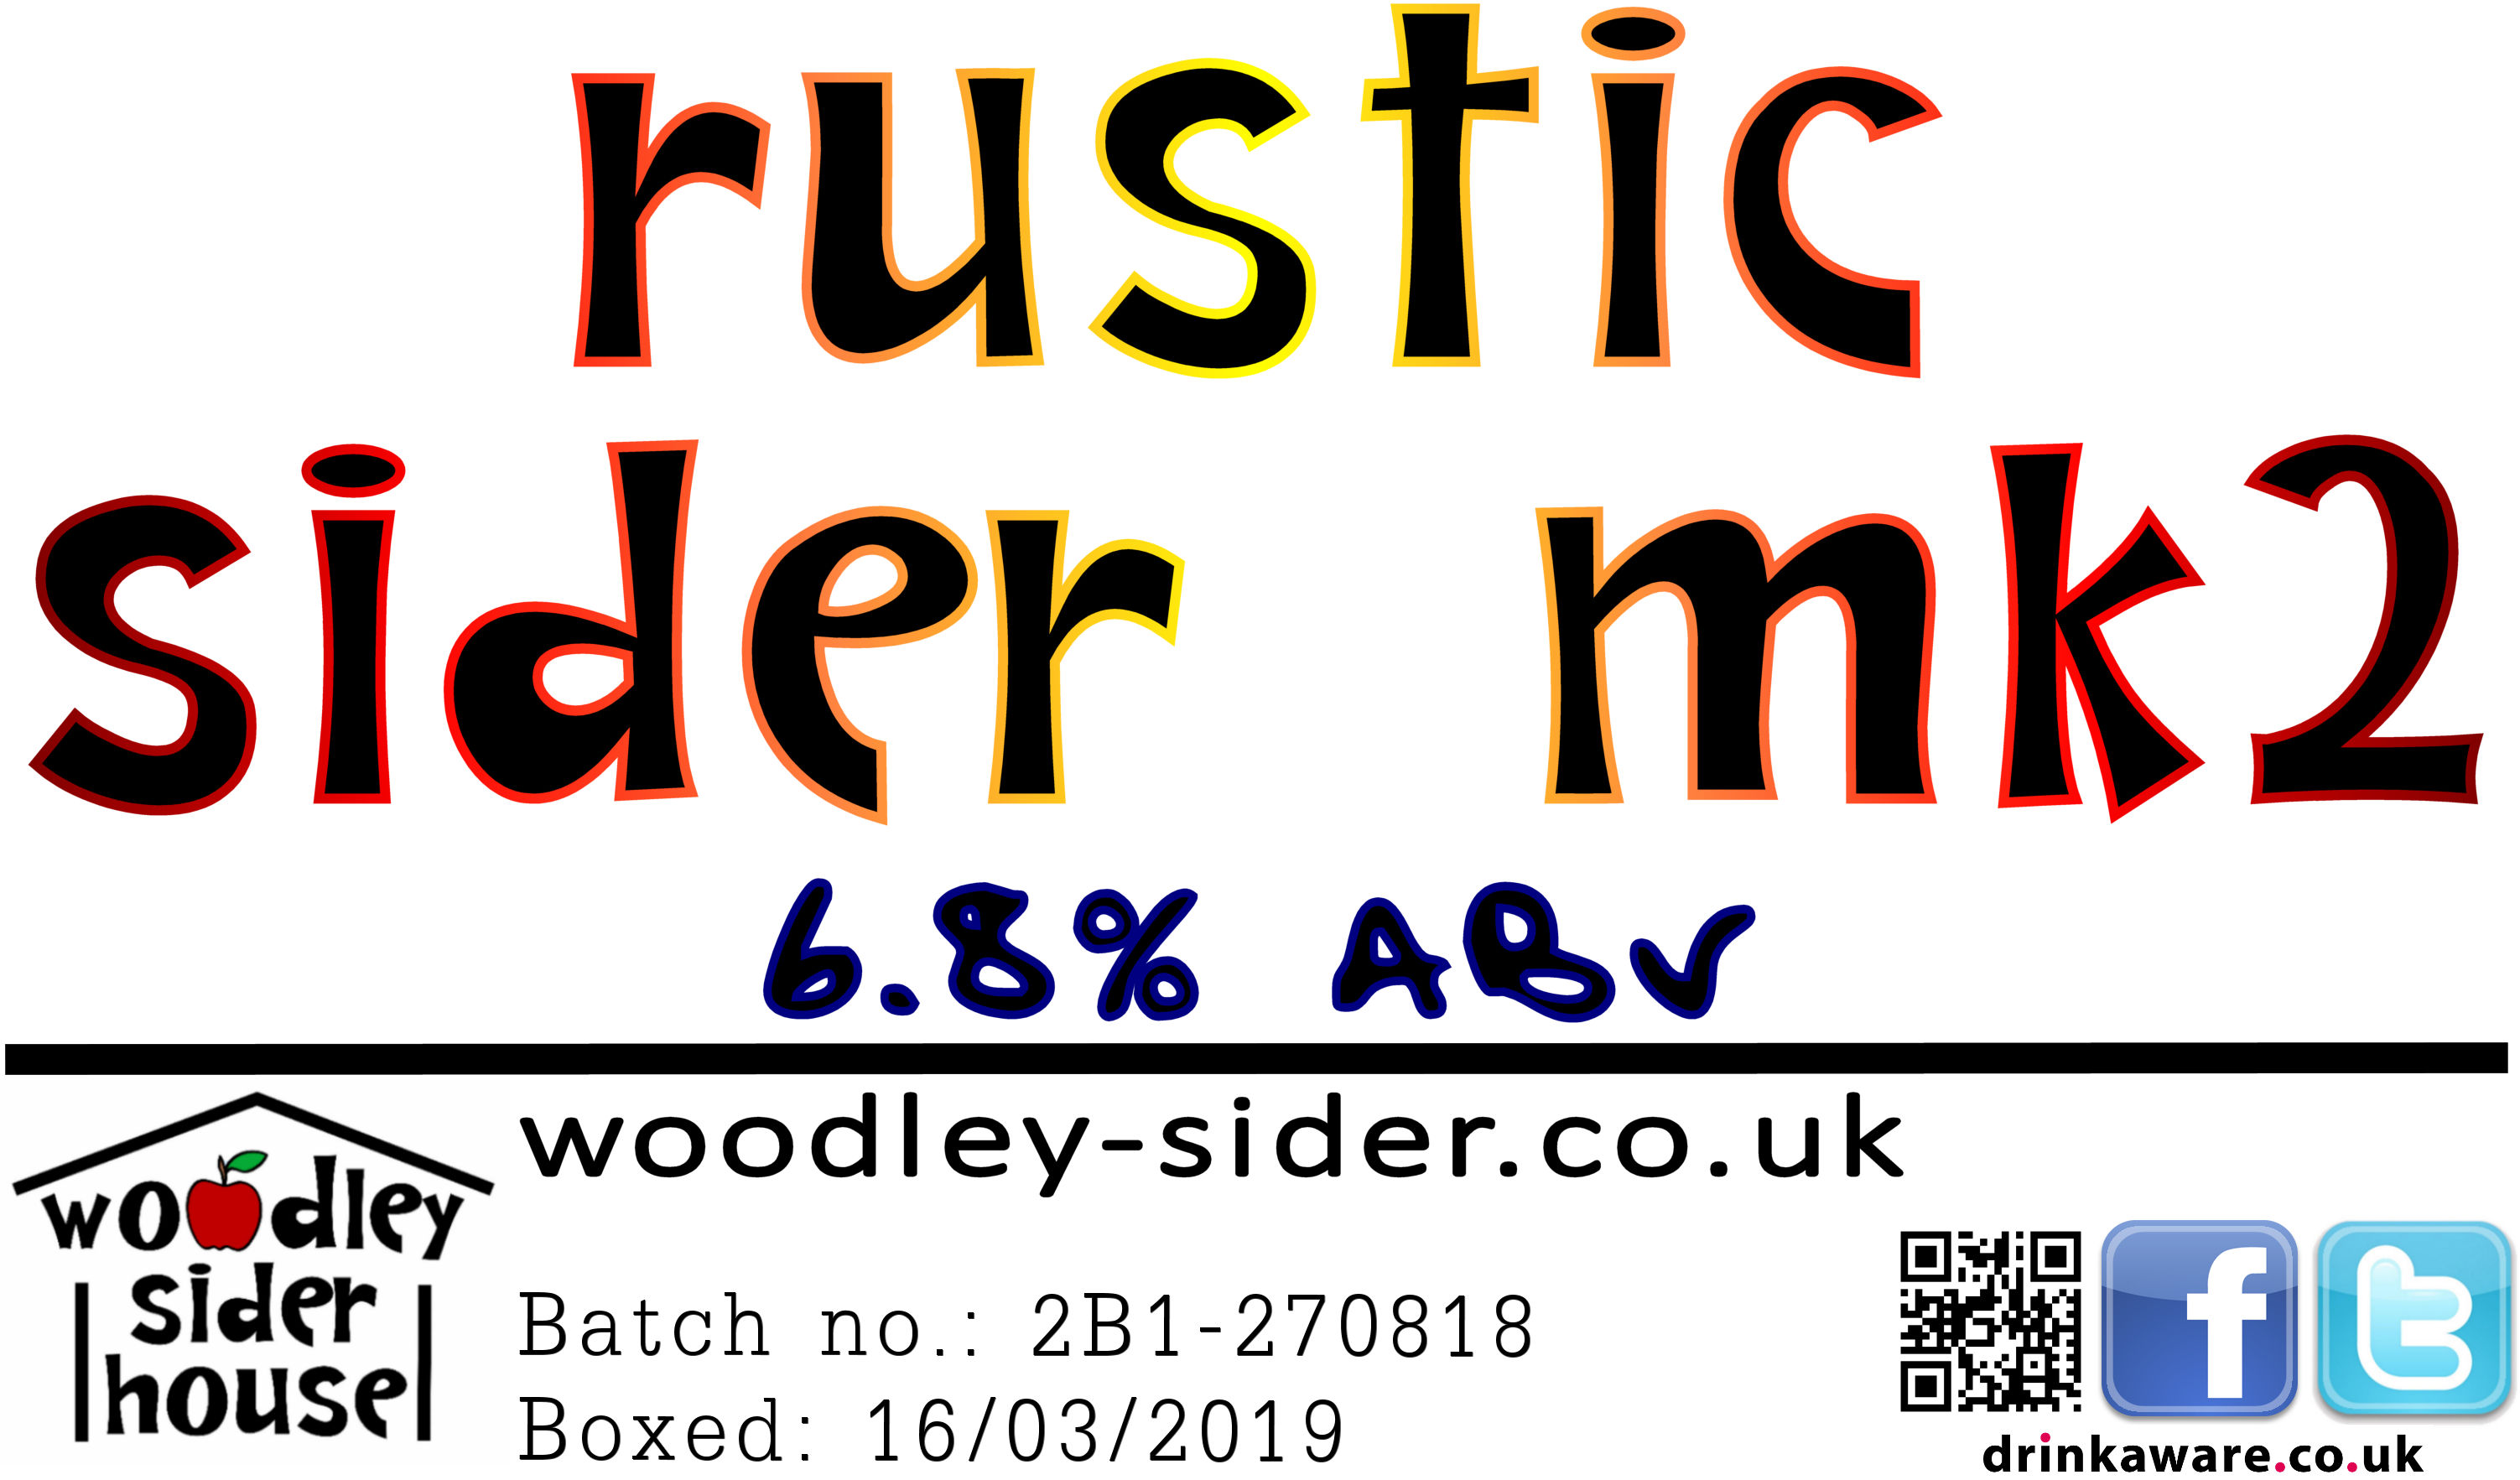 Rustic Sider Mk2_Box.jpg